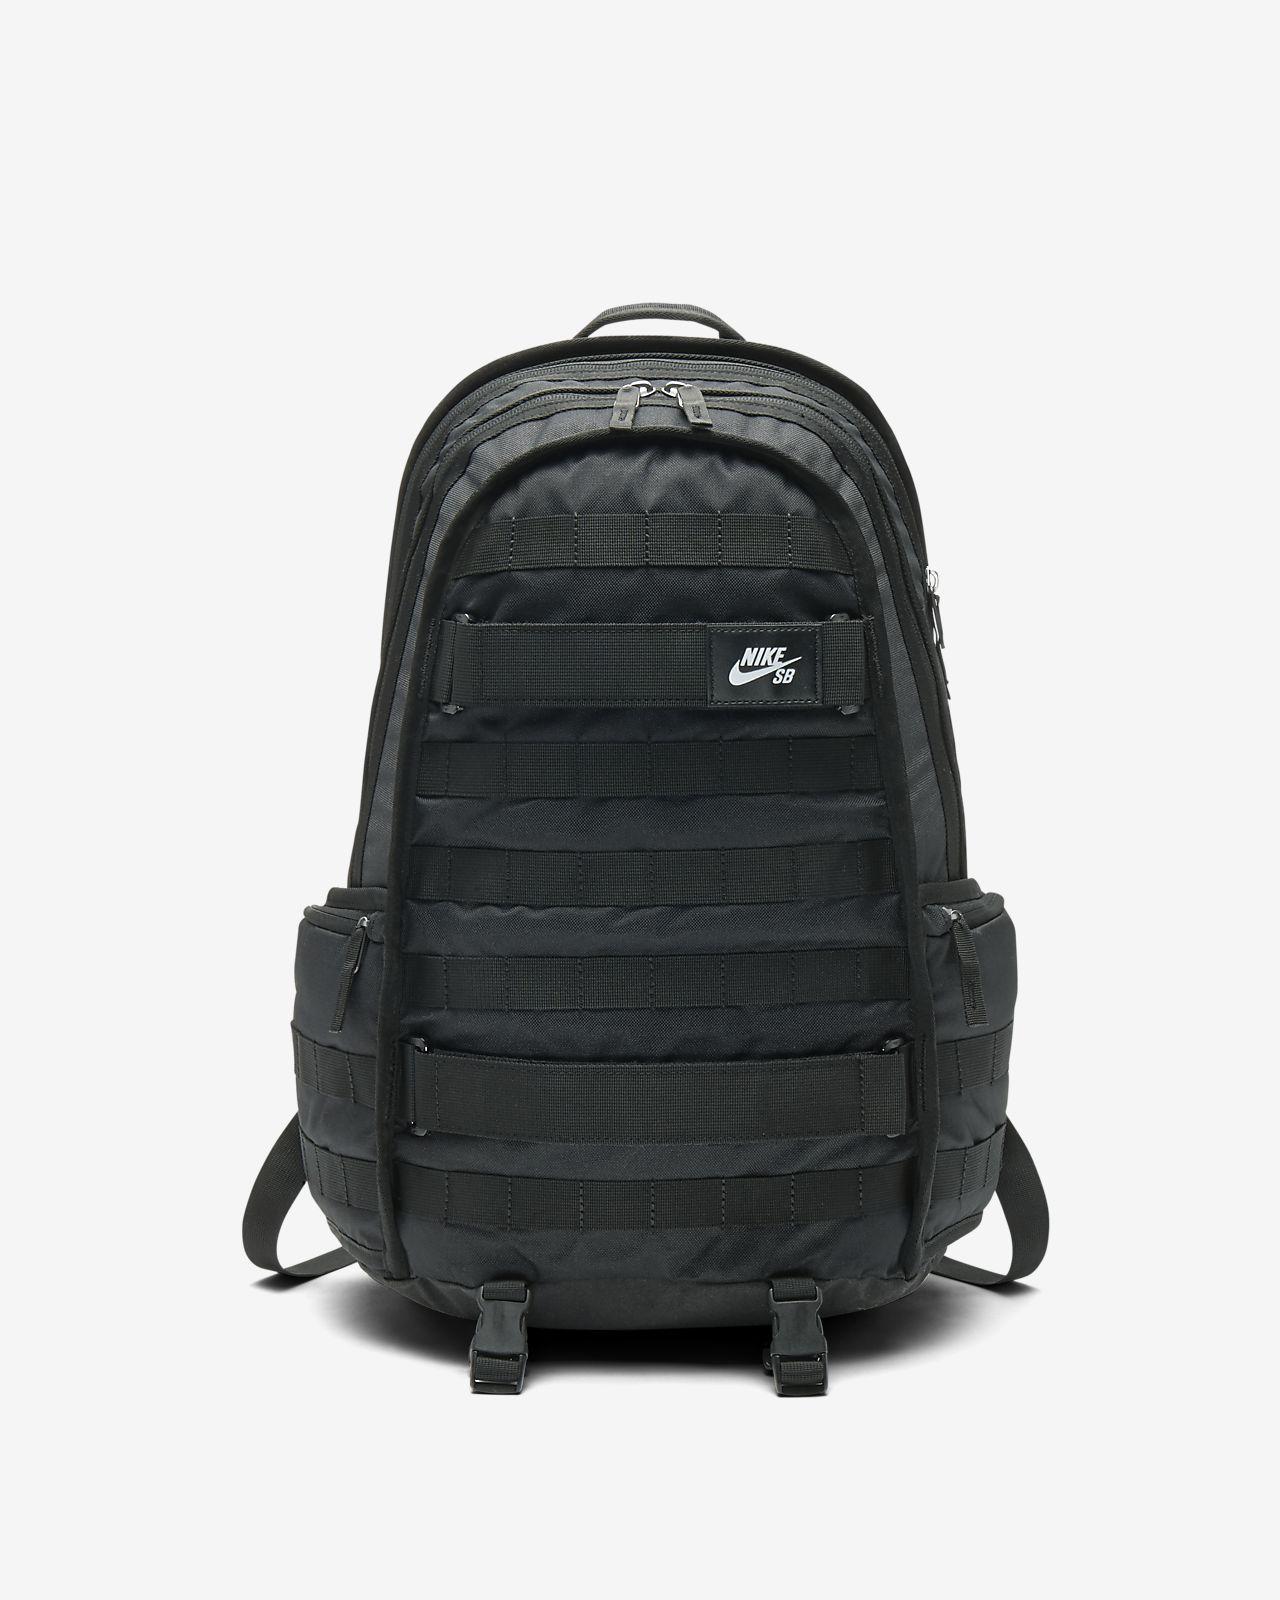 Nike SB RPM - skateboardrygsæk